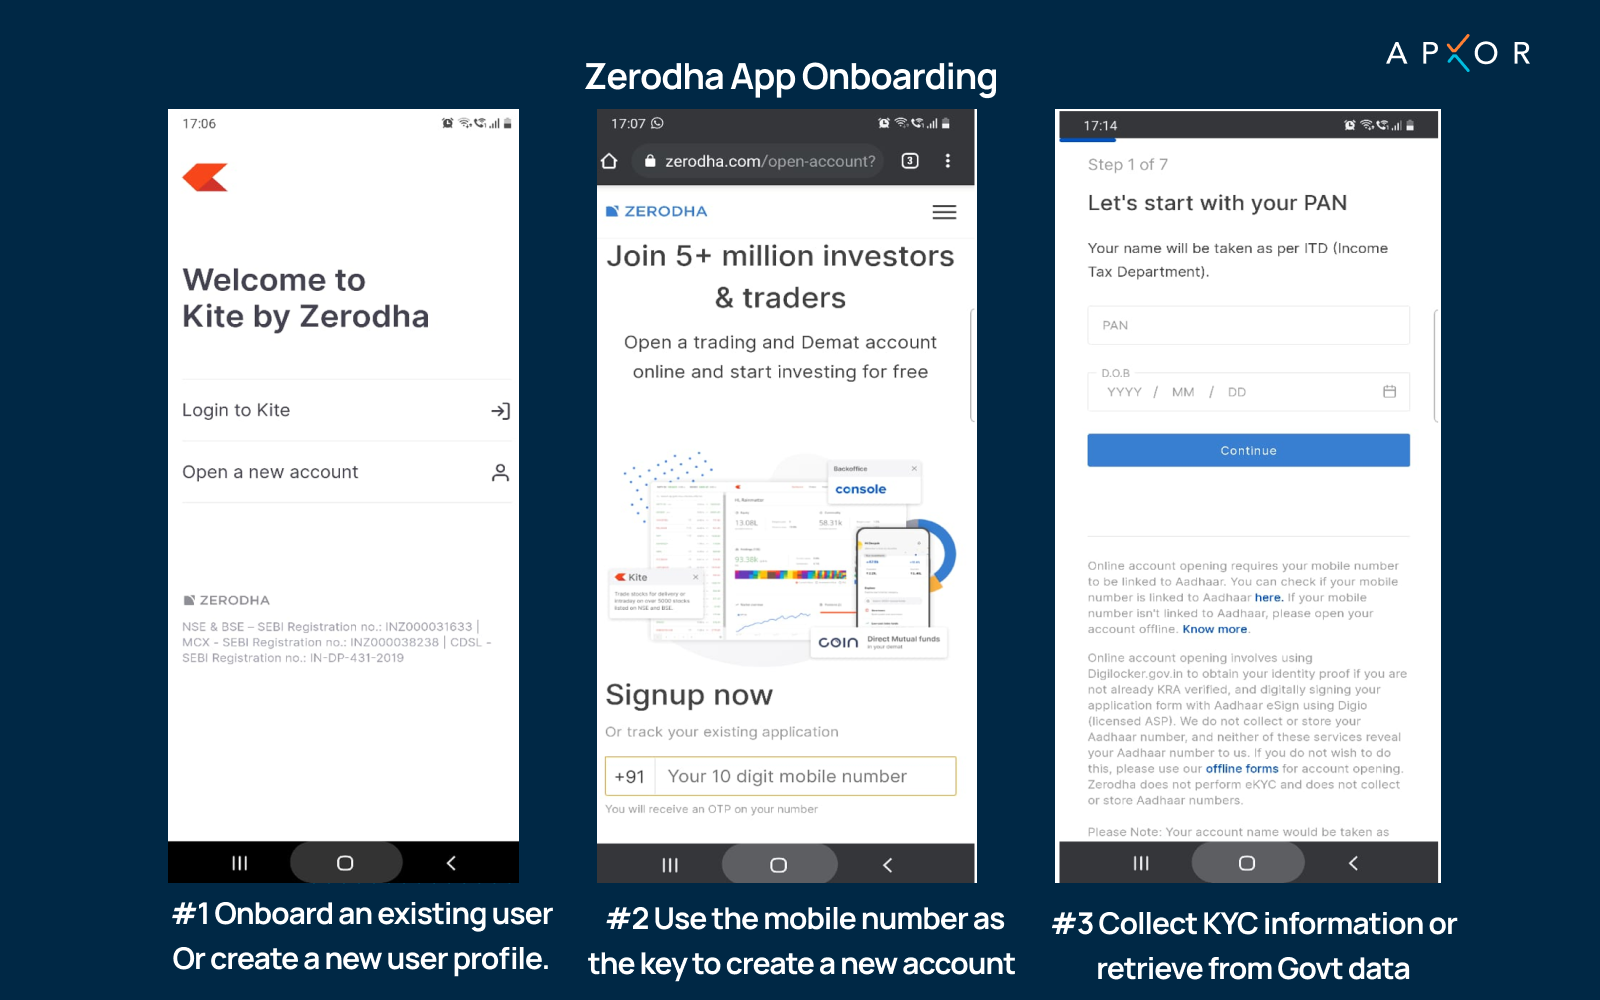 Zerodha app onboarding flow image by Apxor